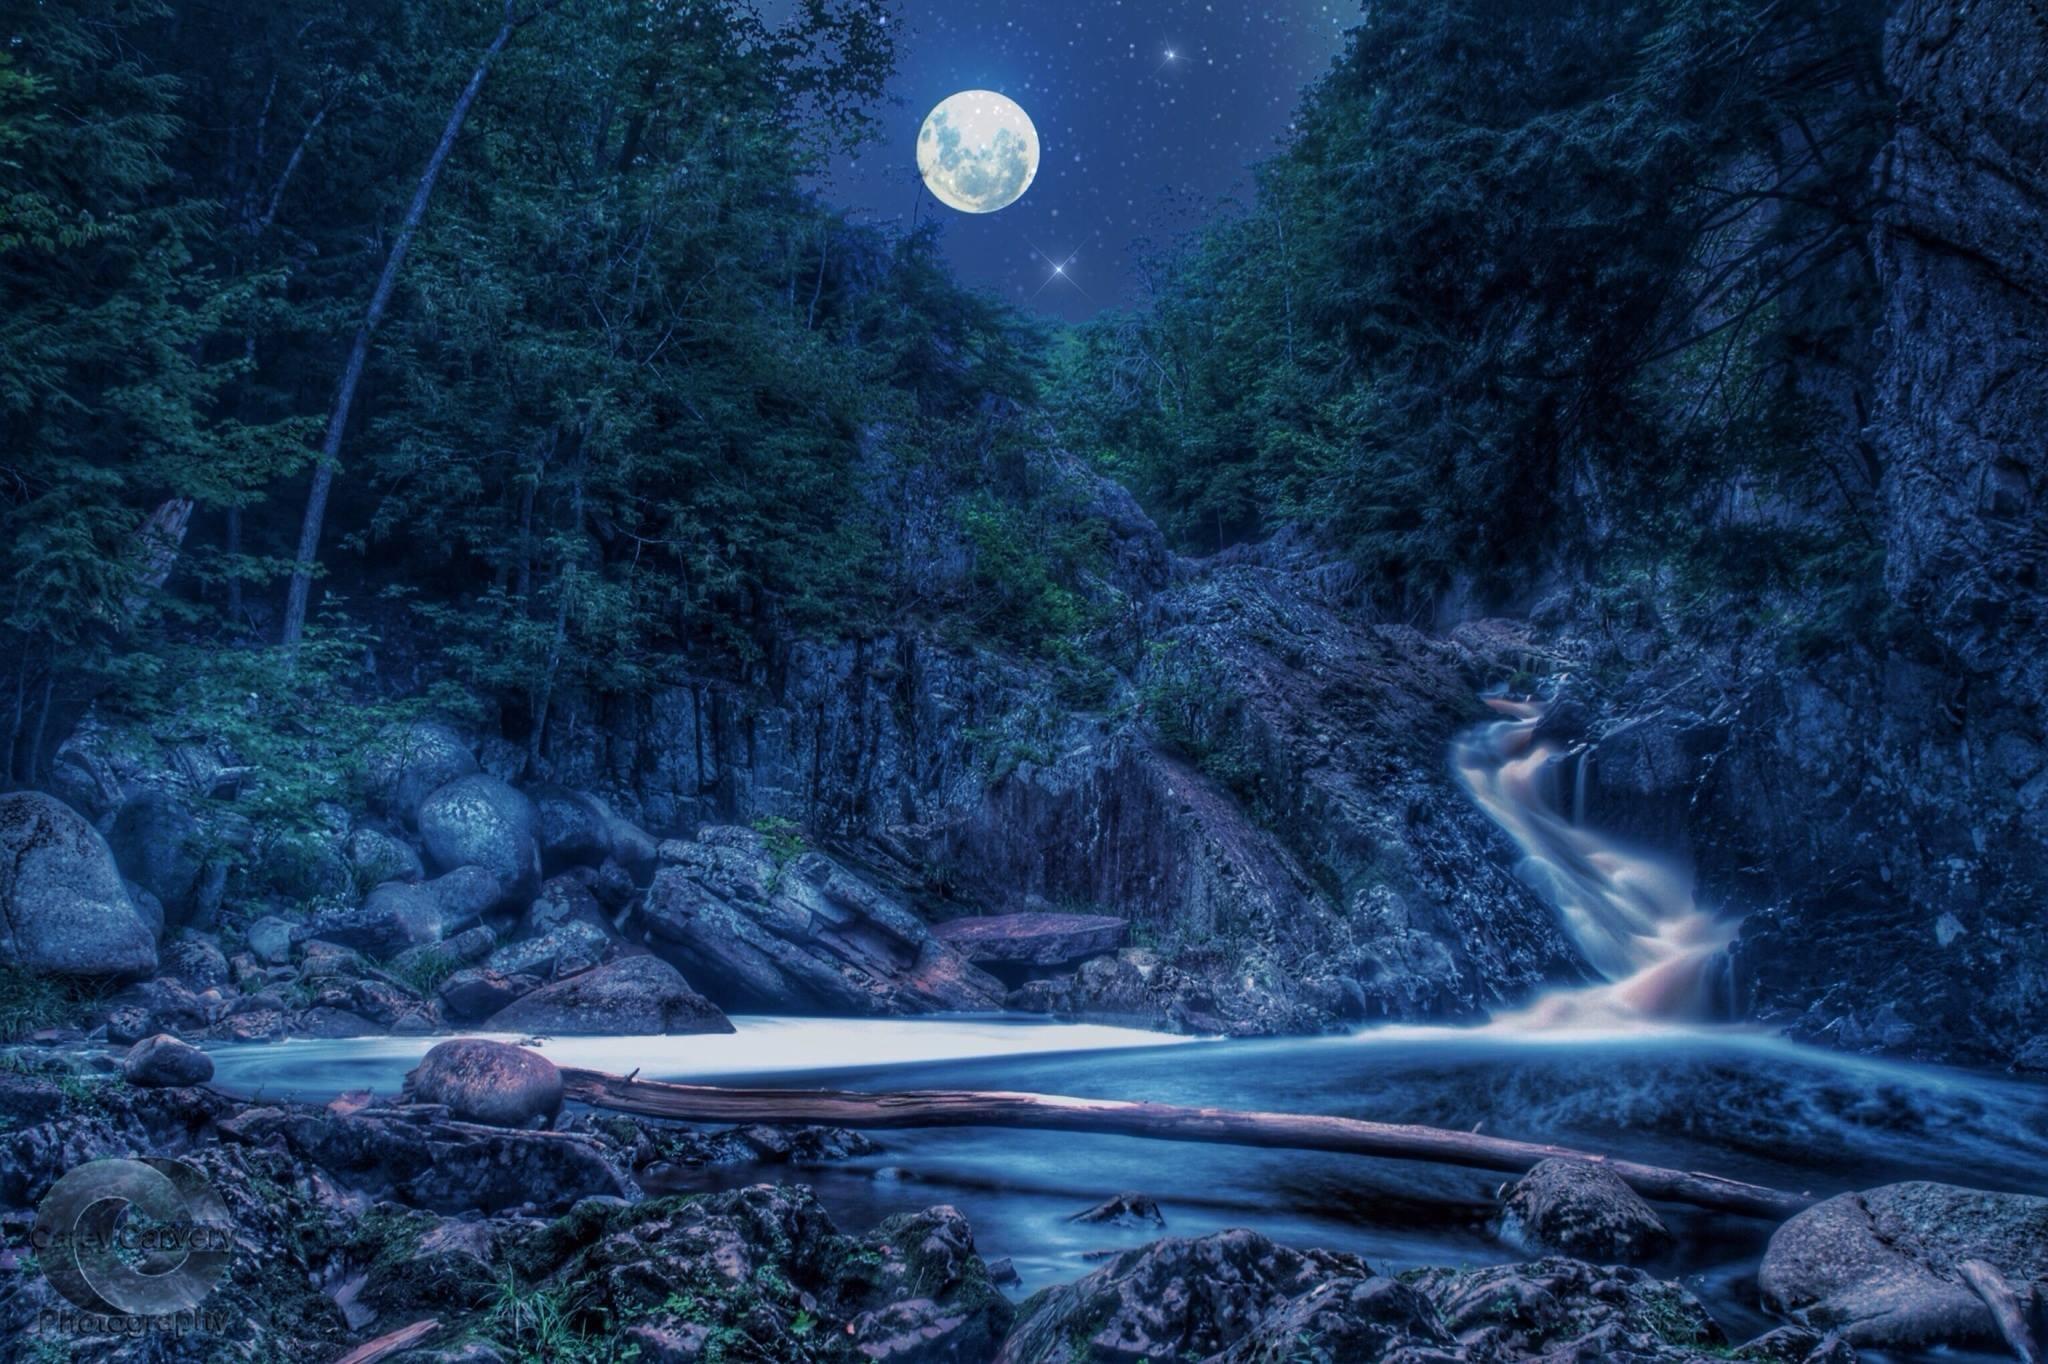 Nova Scotia by night by Carey Carvery